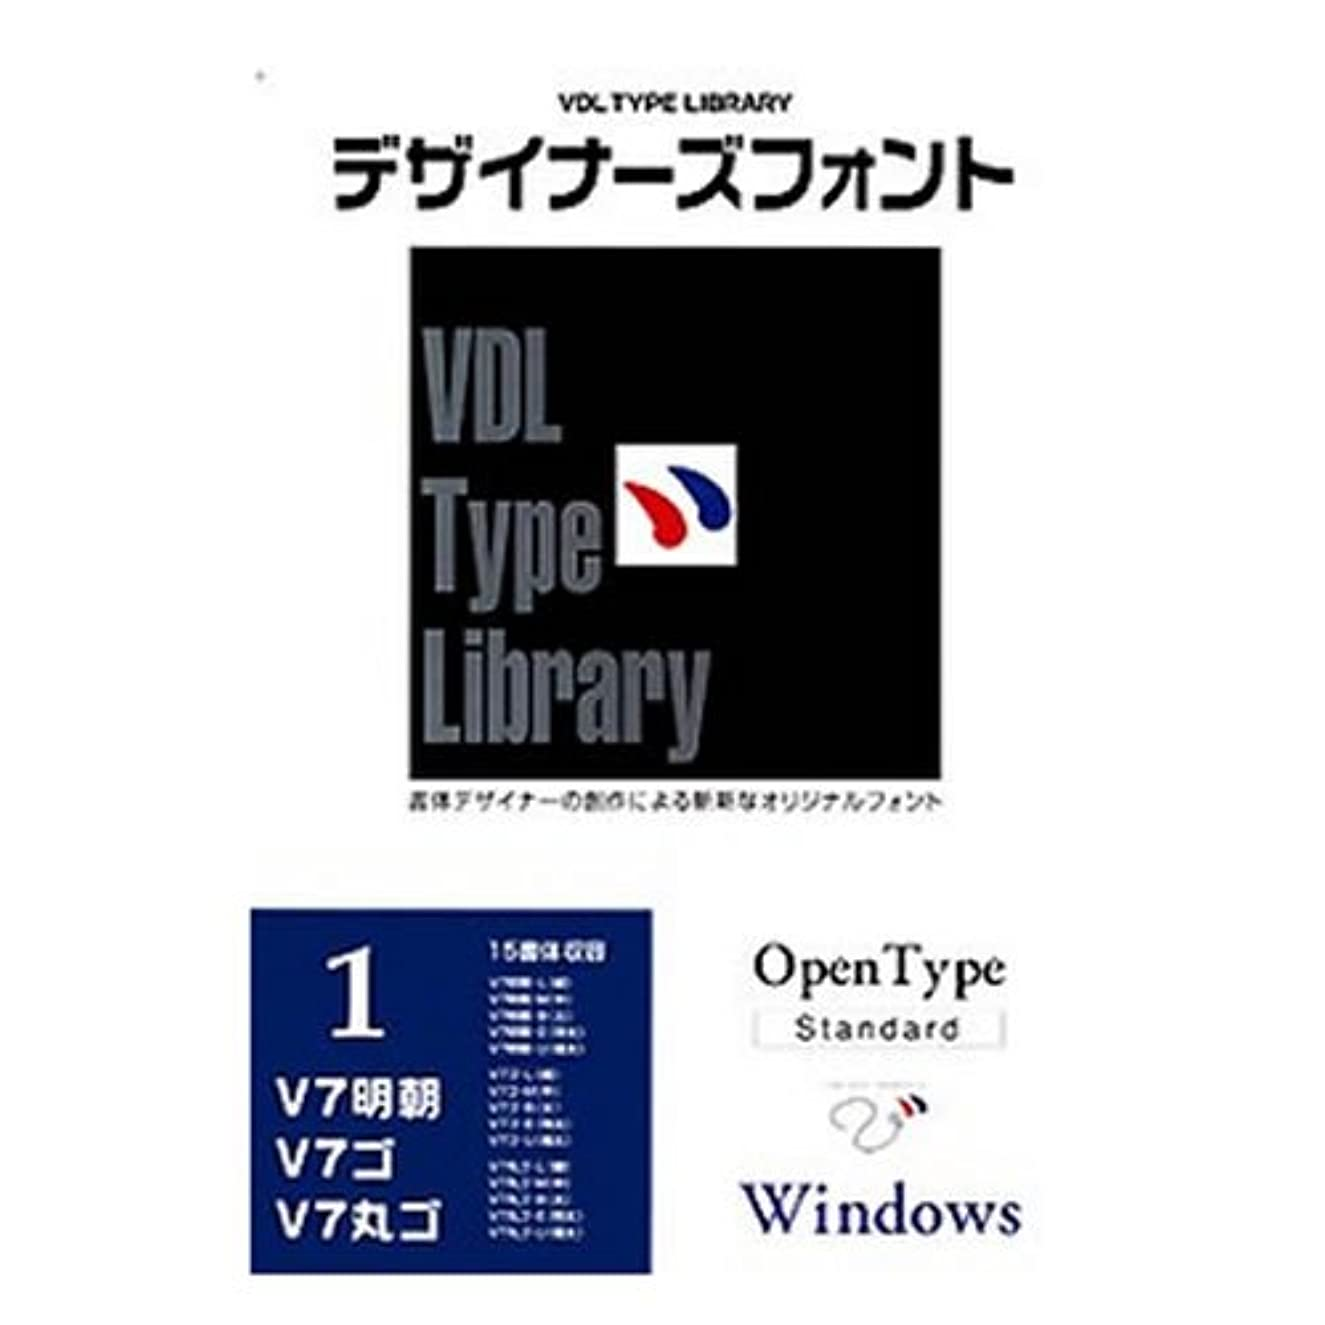 VDL Type Library デザイナーズフォント OpenType (Standard) Windows Vol.1 V7明朝/V7ゴ/V7丸ゴ